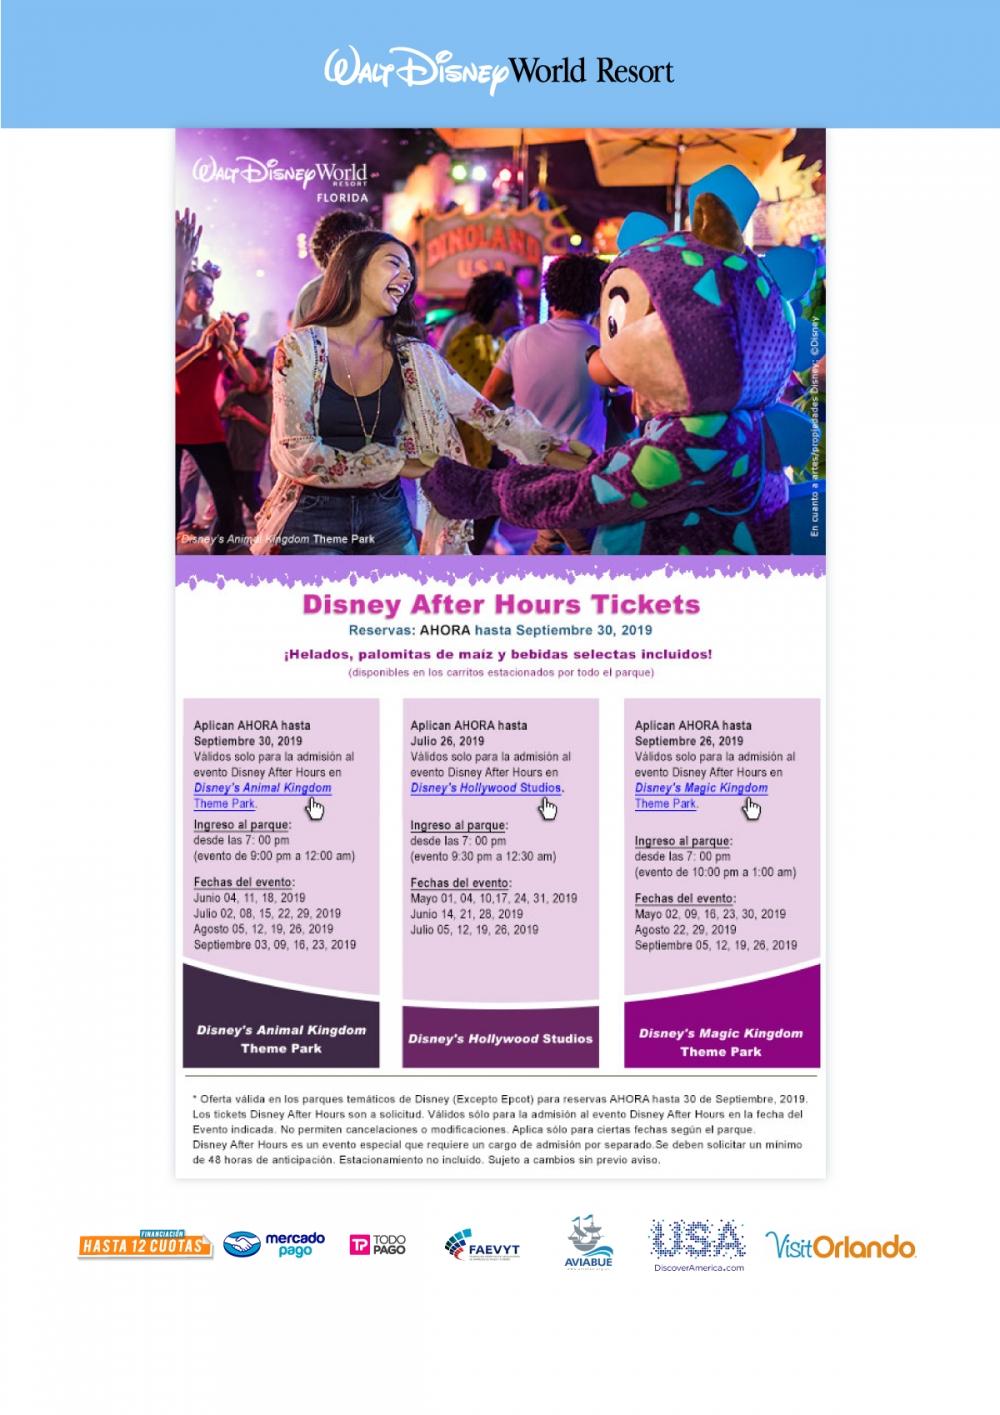 Walt Disney World - Disney After Hours Tickets